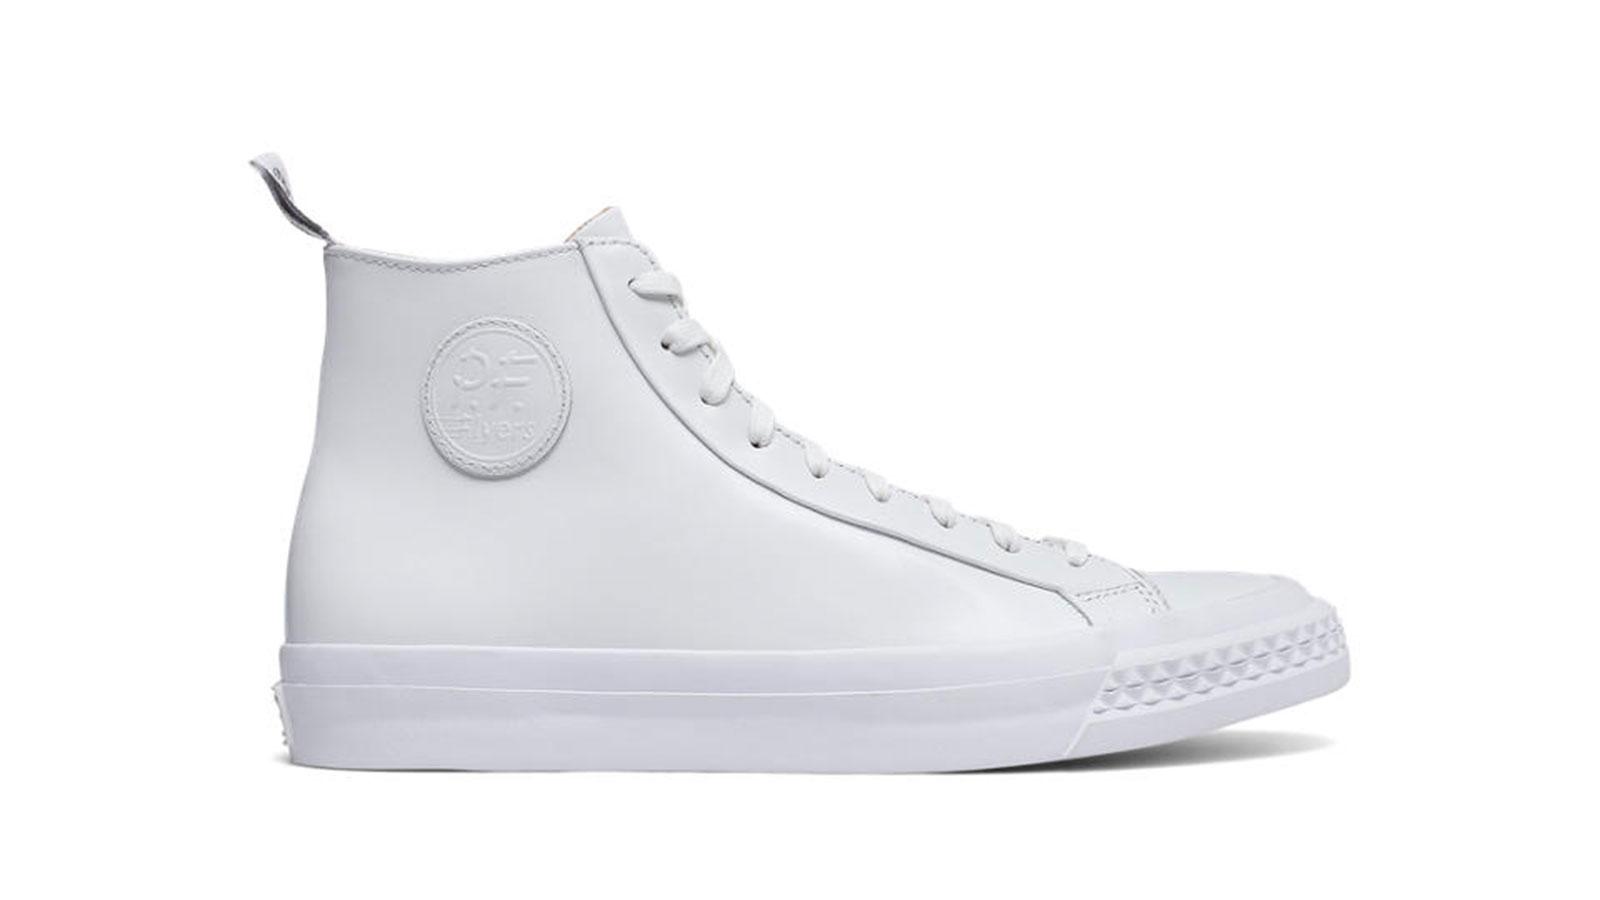 Todd Snyder PF Flyer Nubuck Rambler | best mens white sneakers